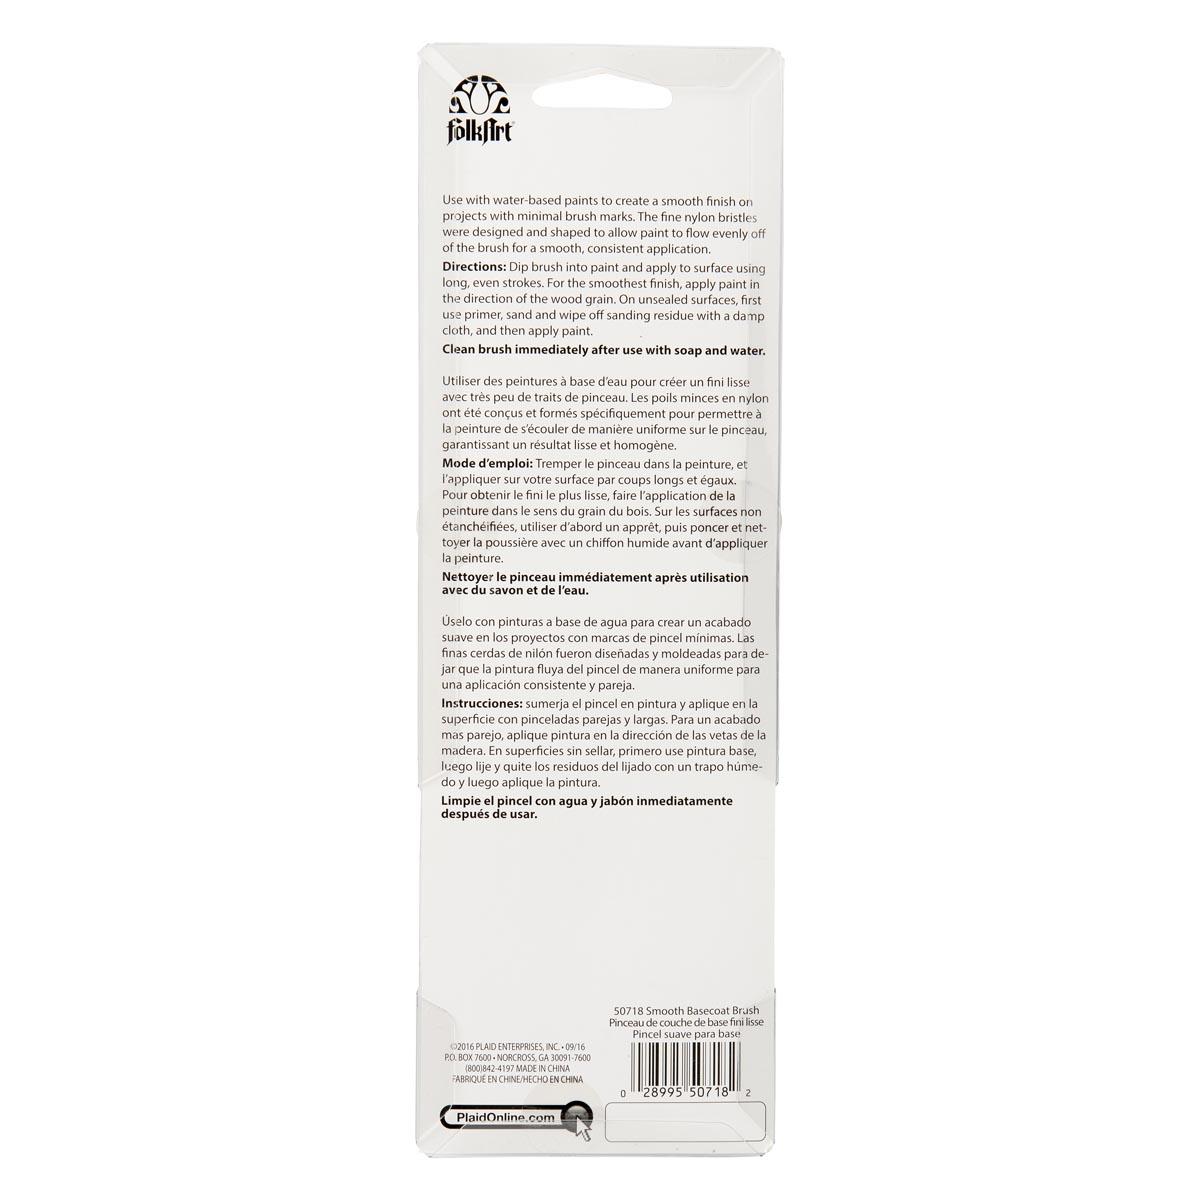 Folkart ® Brushes - Smooth Basecoat 2